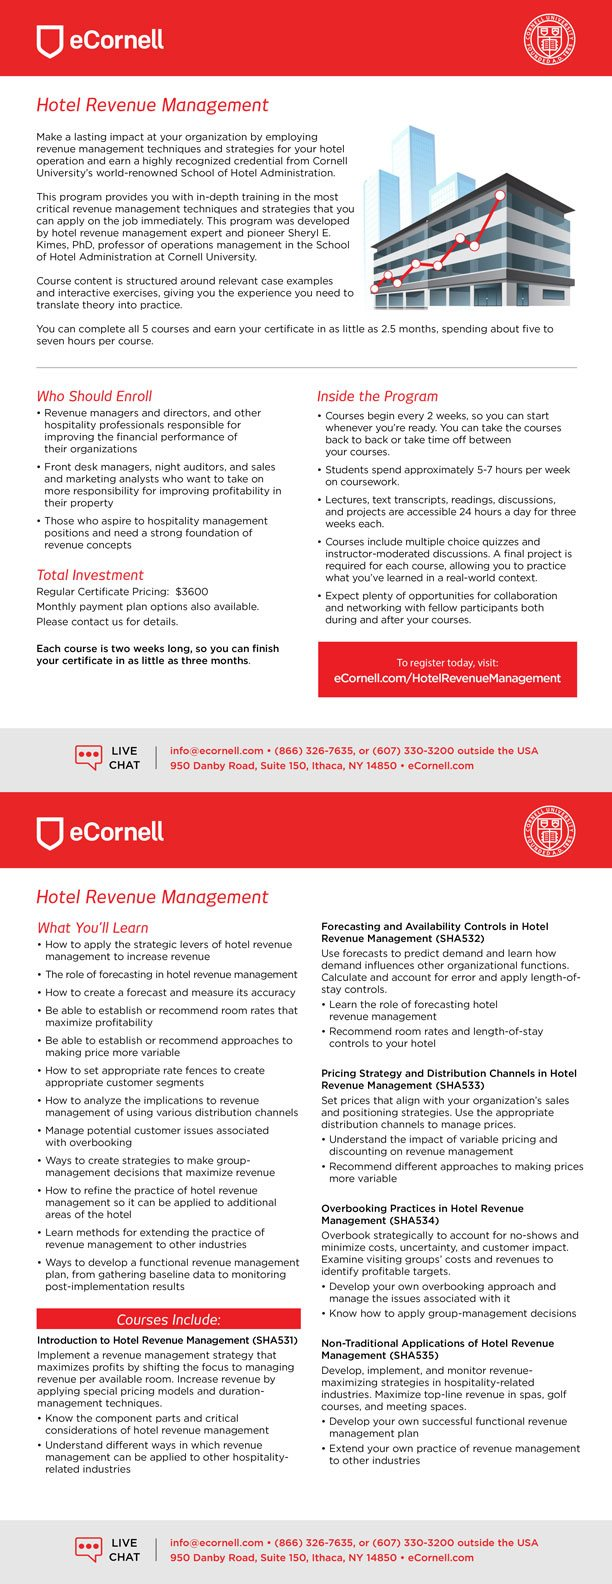 Hotel Revenue Management Certificate